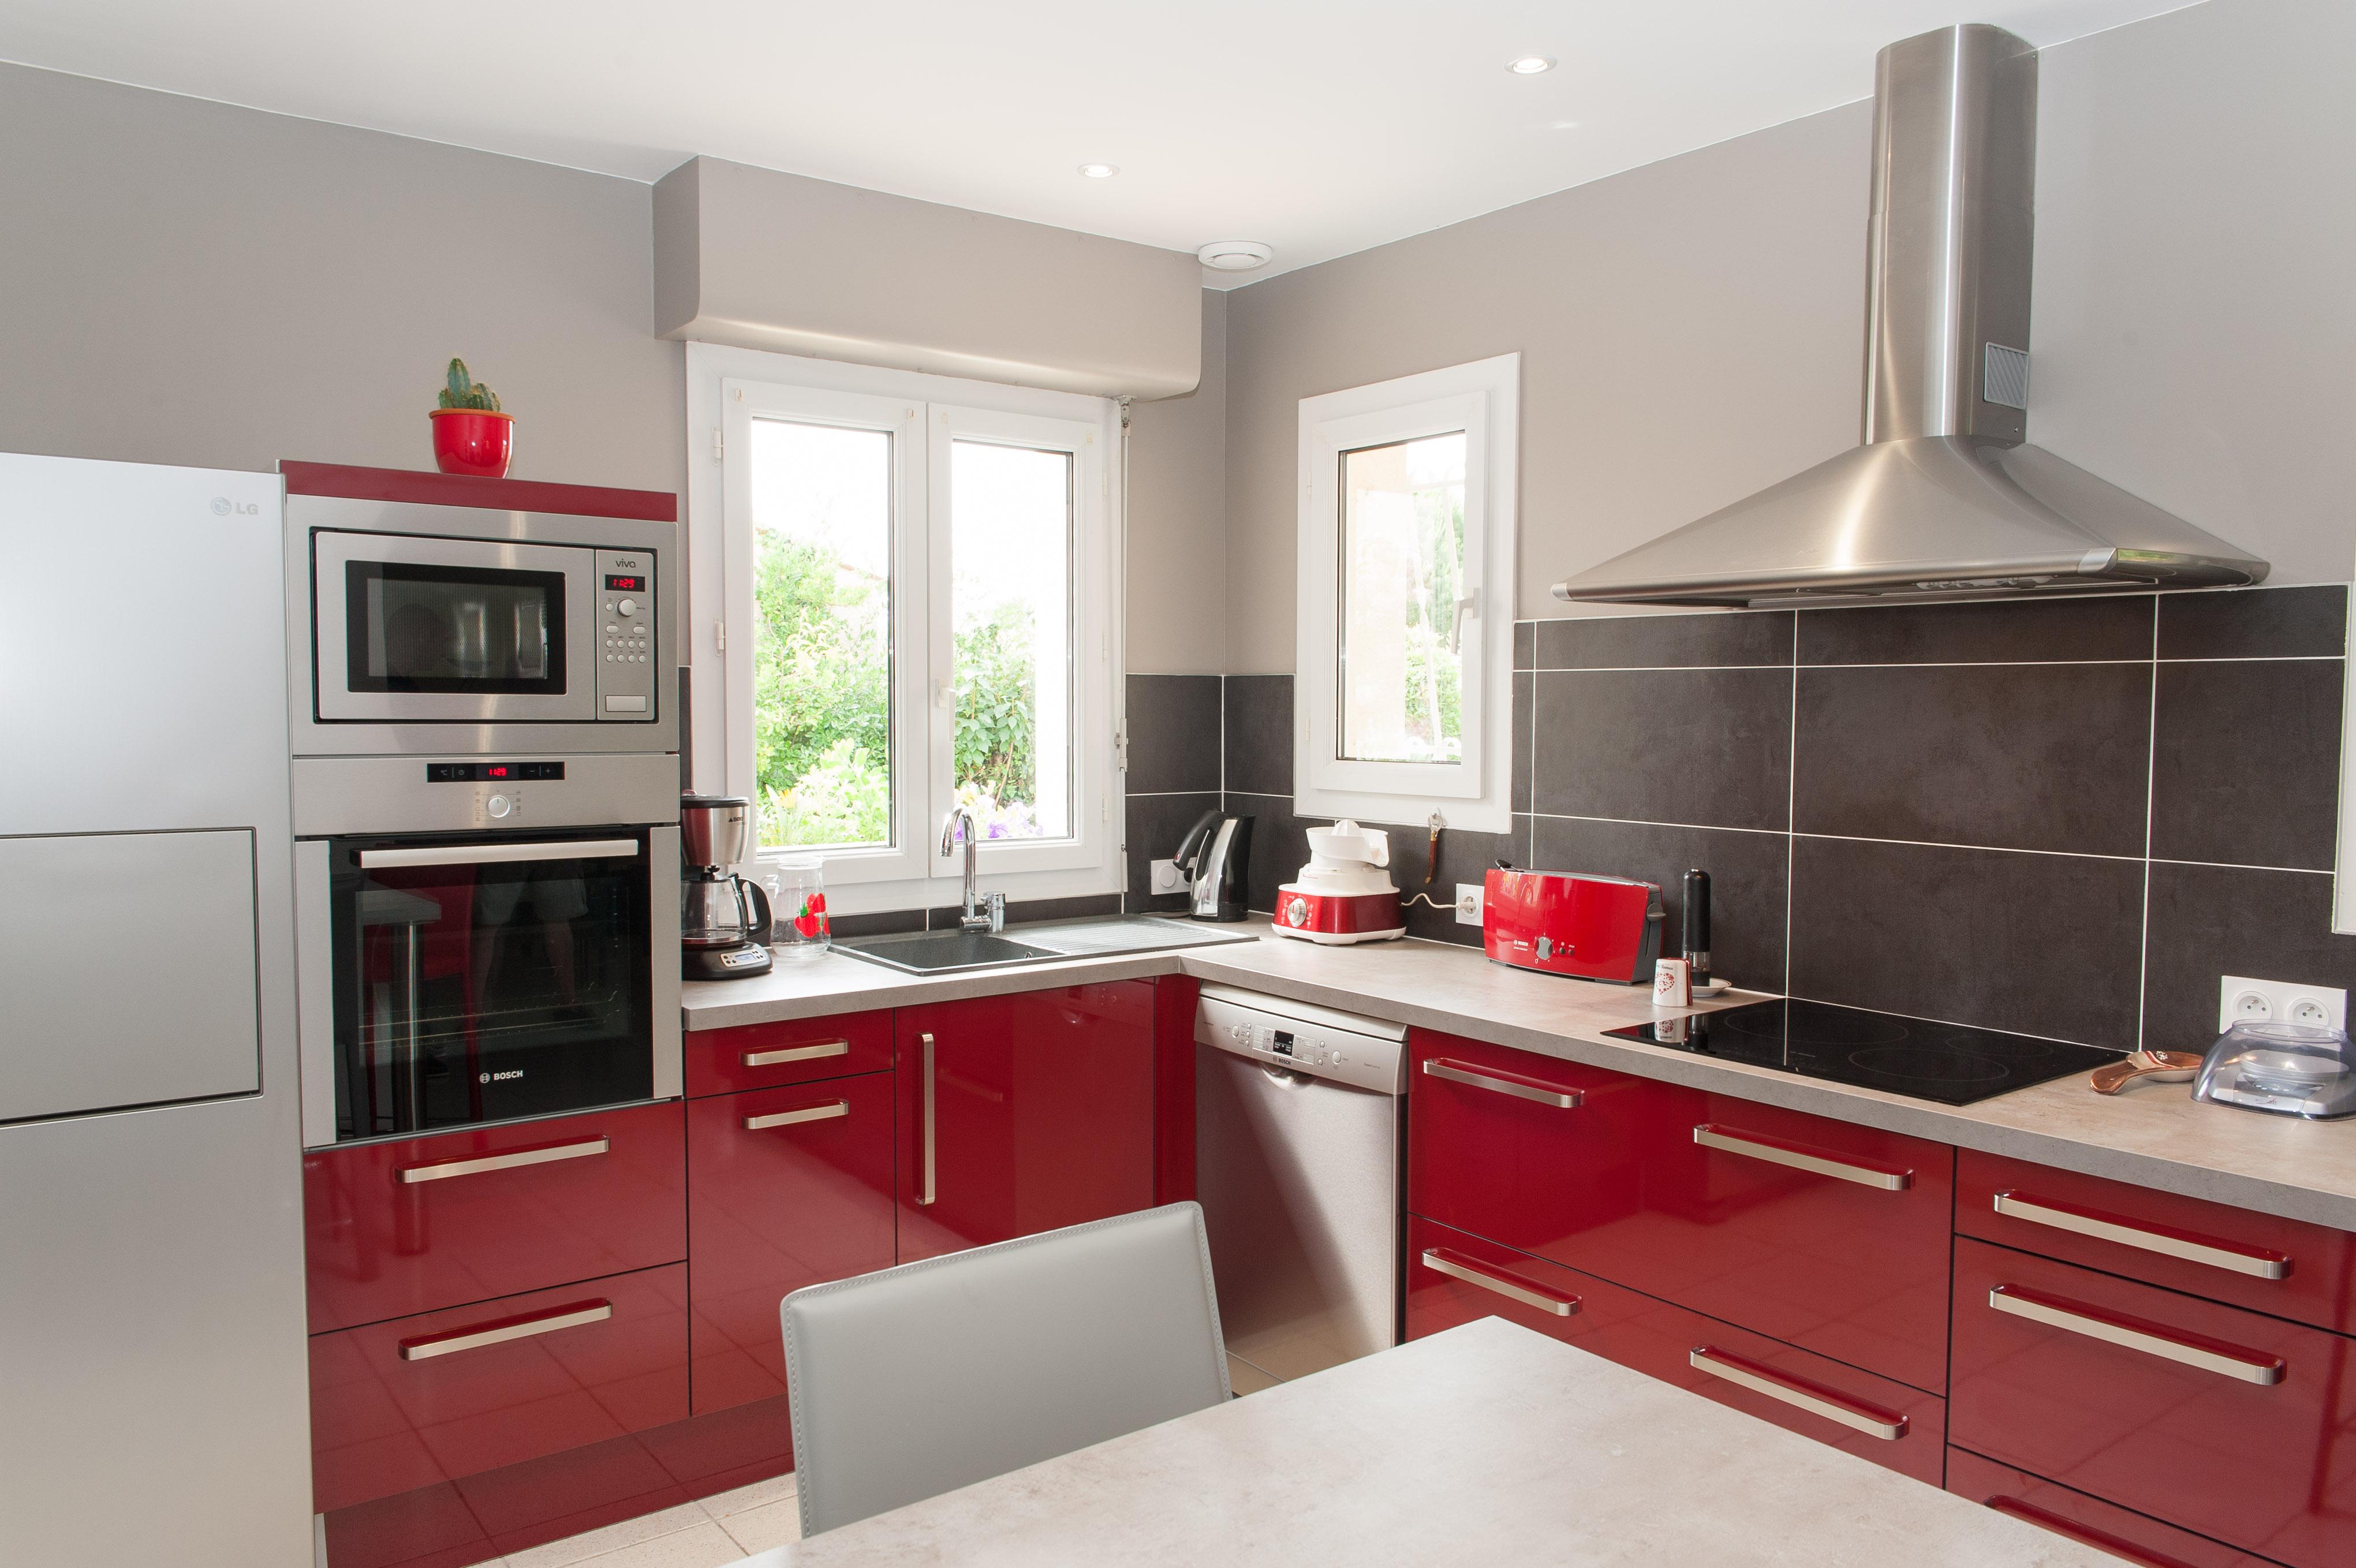 ol ron meubles cuisine brio ol ron meubles. Black Bedroom Furniture Sets. Home Design Ideas